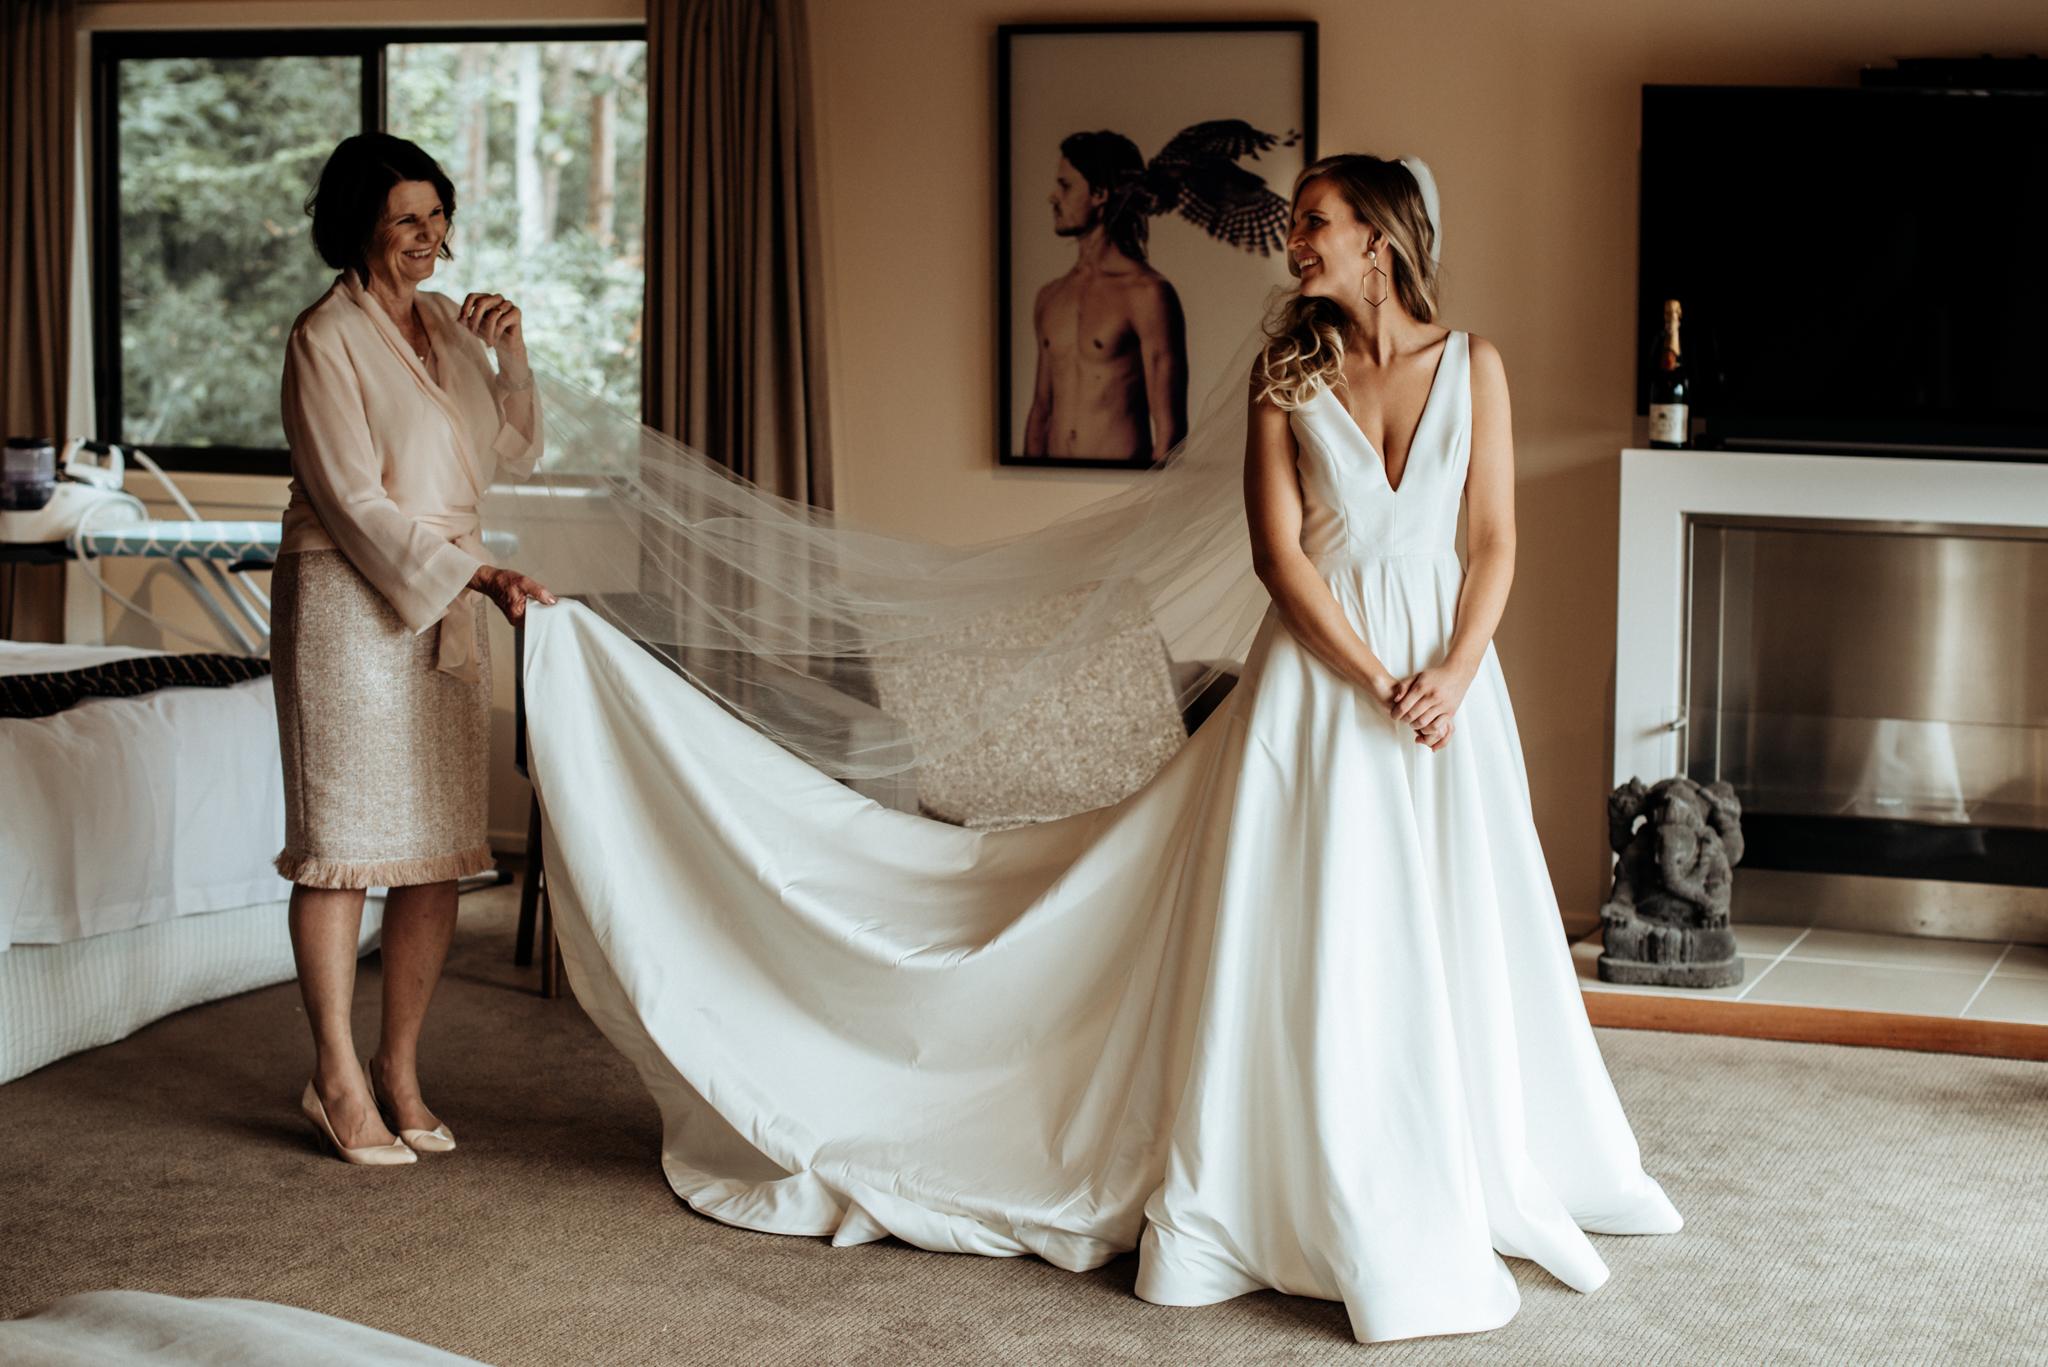 LOVELENSCAPES PHOTOGRAPHY • B+T • BYRON BAY WEDDING PHOTOGRAPHER • ALTITUDE 261 • 87.jpg